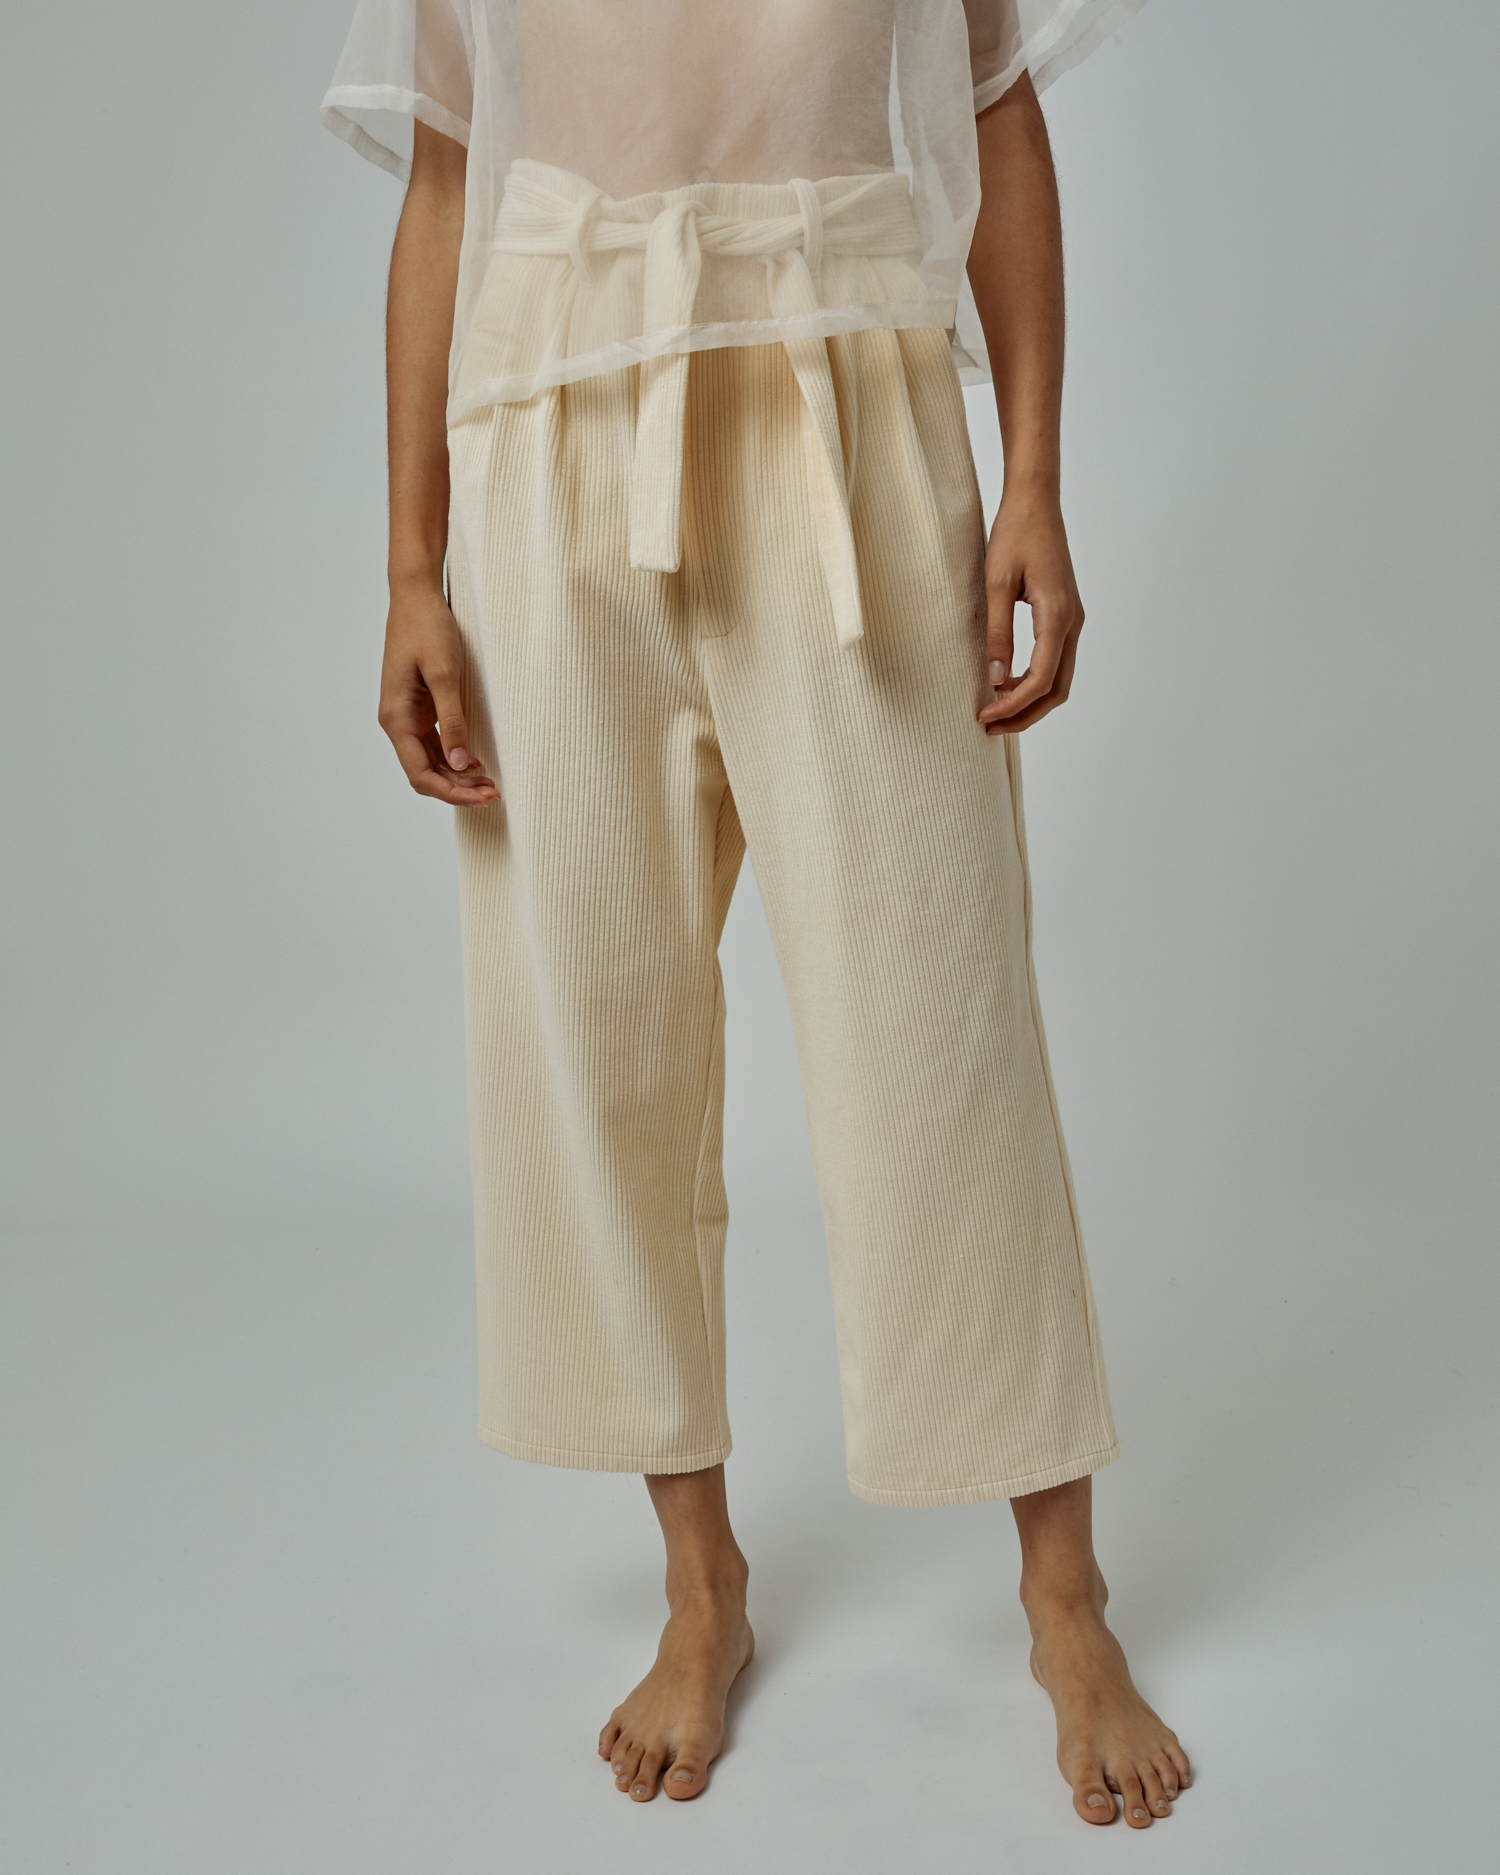 Shop Designer Paperbag Waist Pant In 100% Cotton